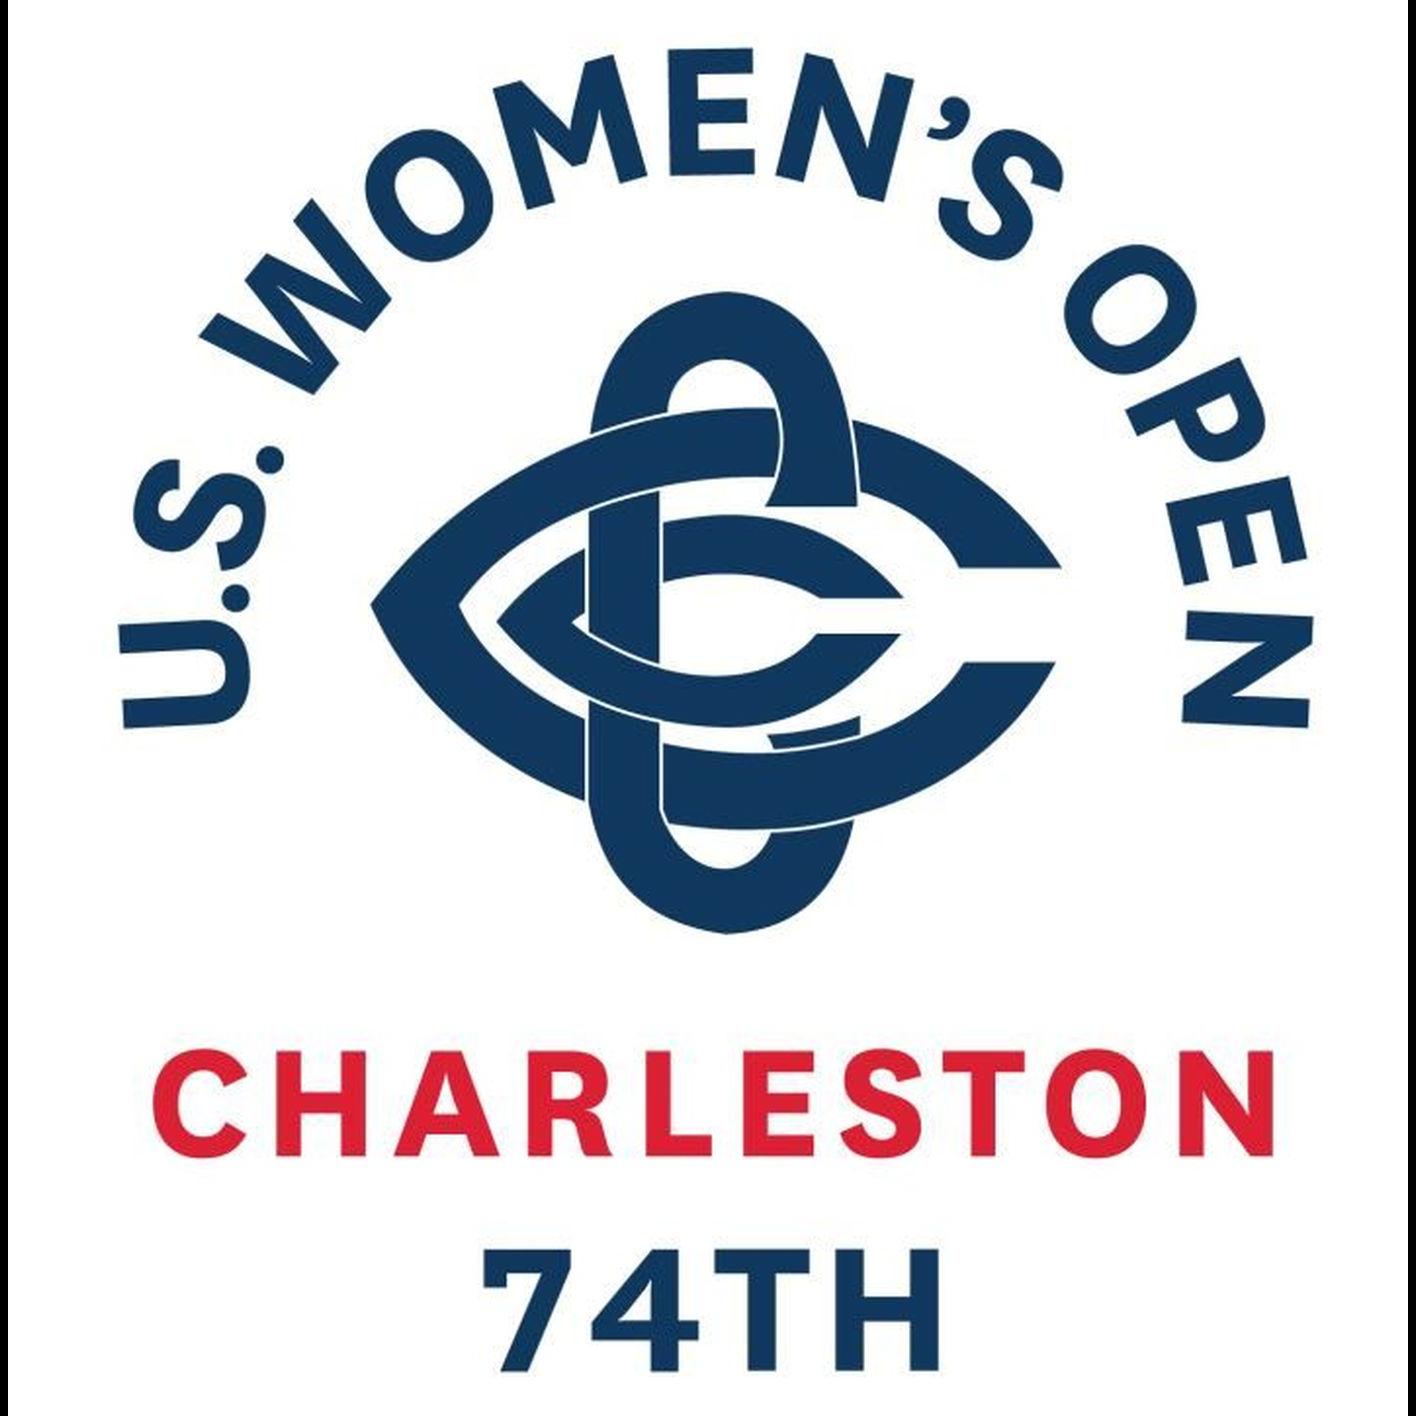 2019 Golf Women's Major Championships - US Women's Open